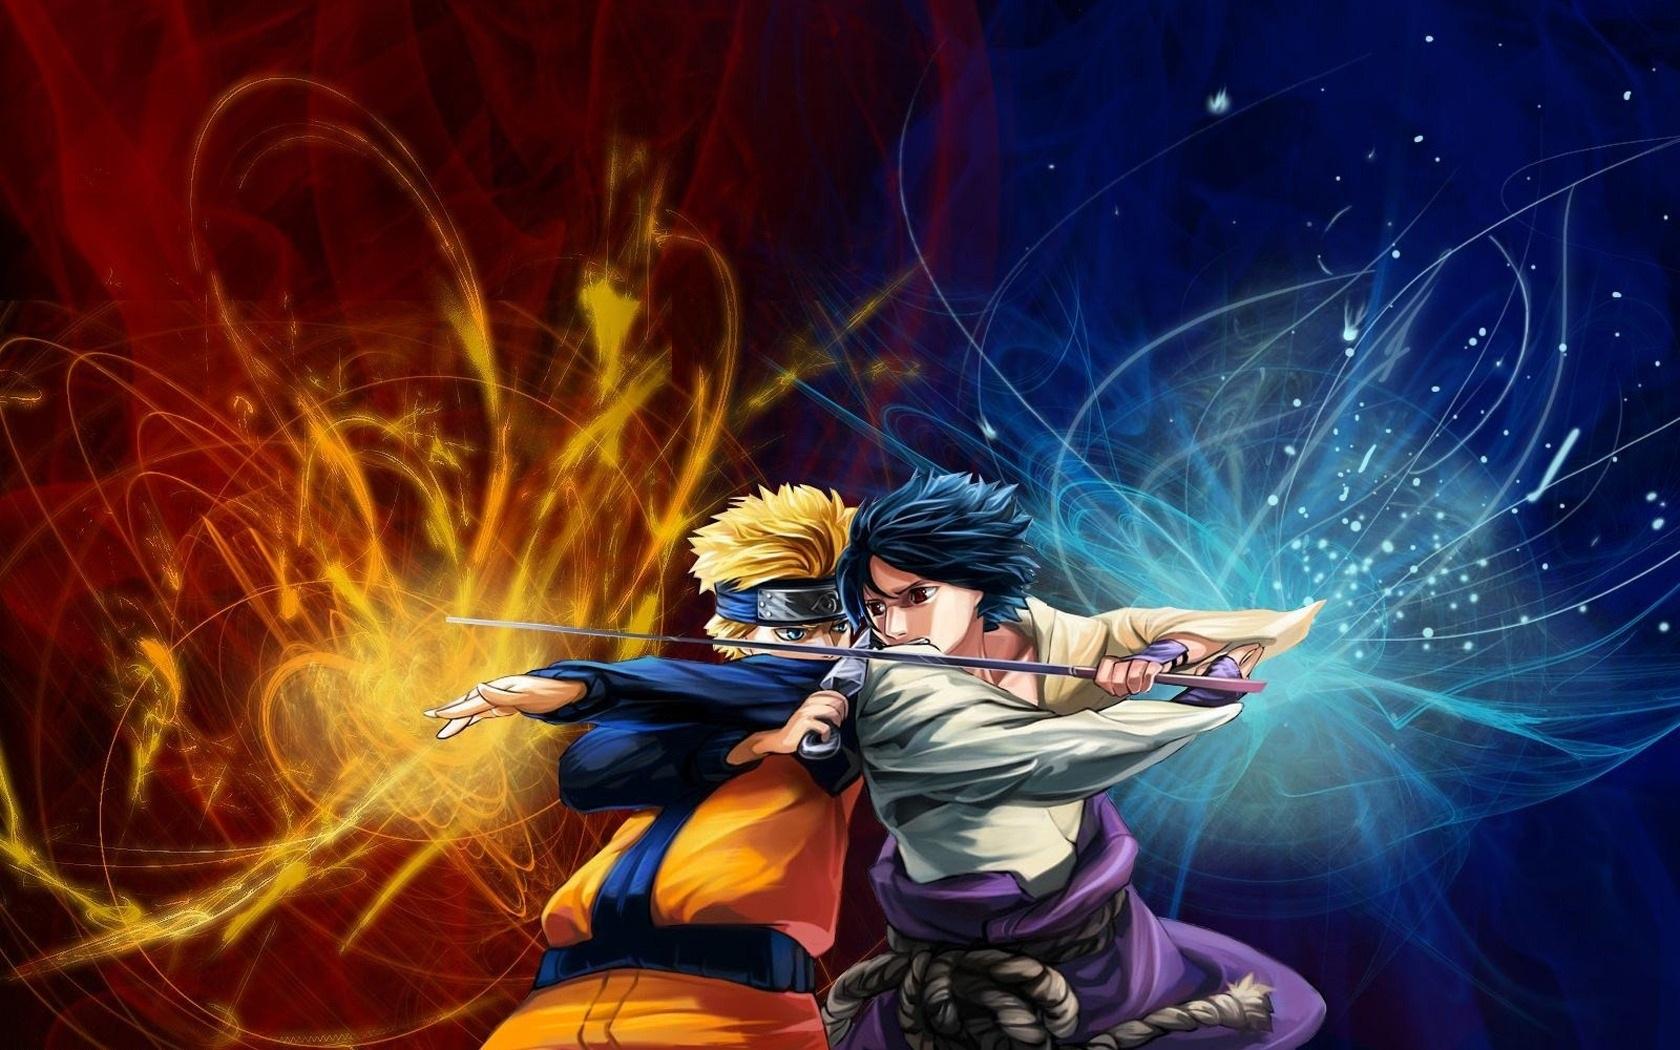 Naruto Vs Sasuke 1680x1050 Hd Hintergrundbilder Hd Bild